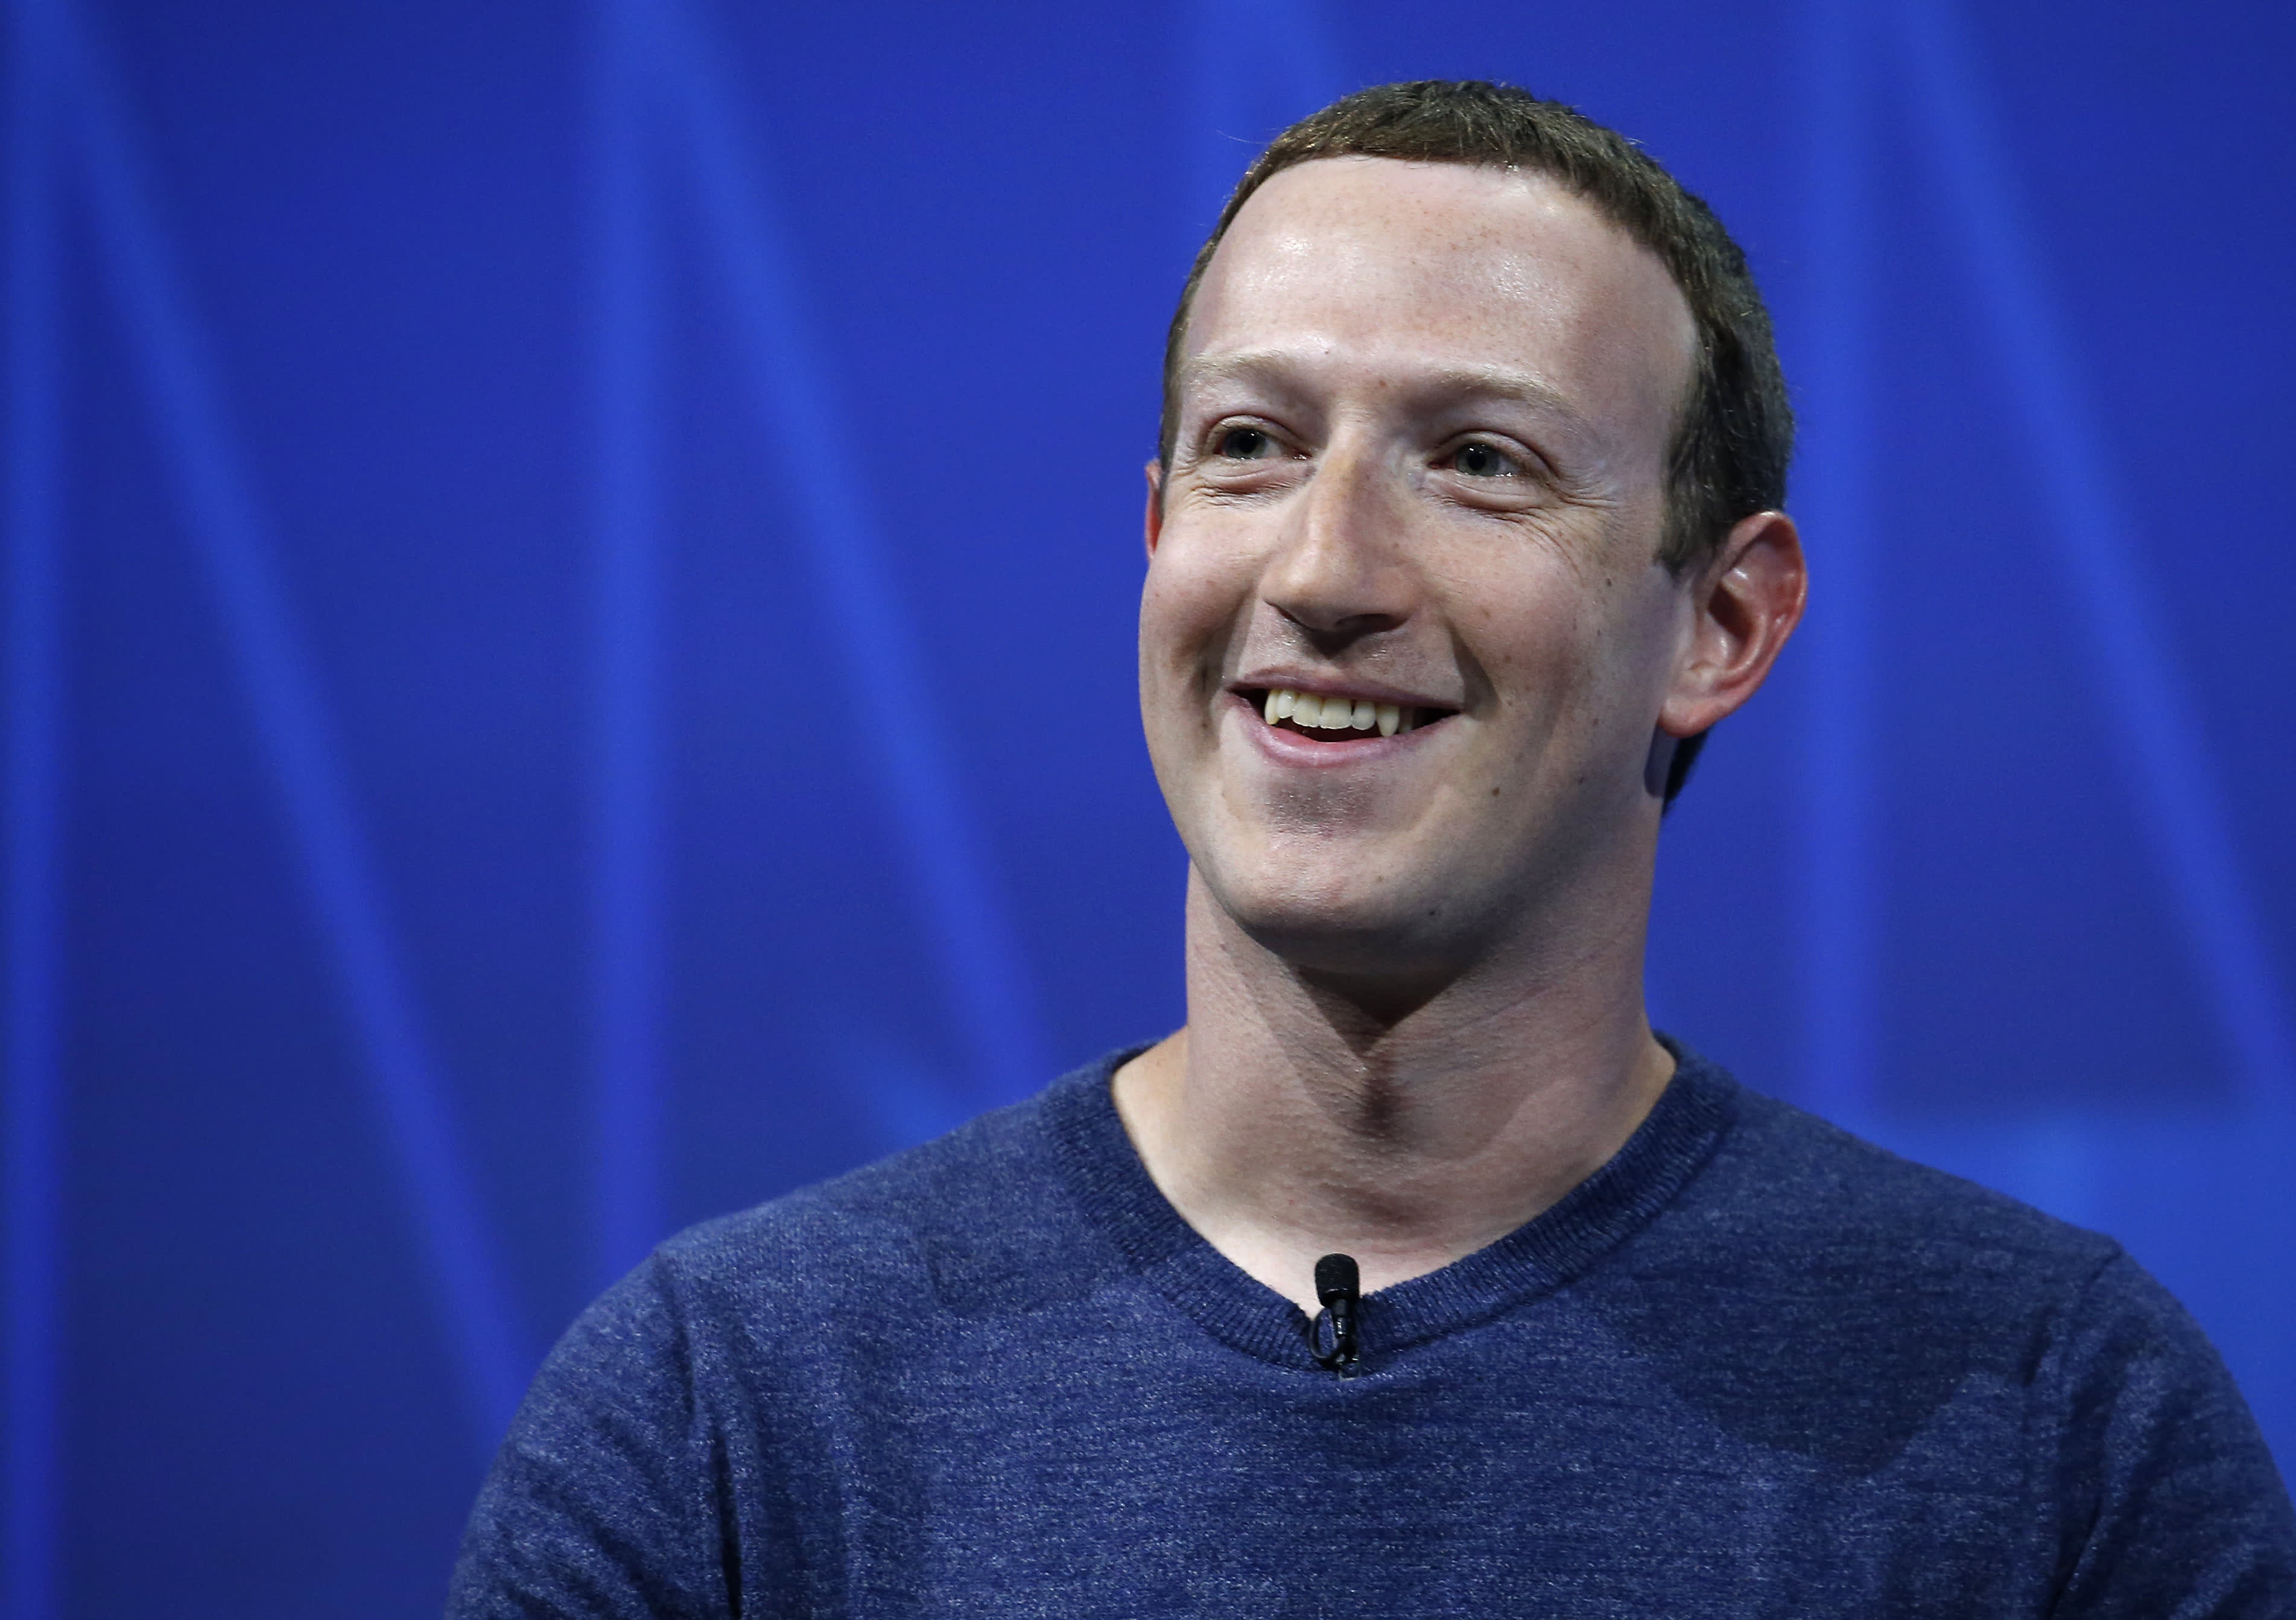 Mark Zuckerberg announces new ways for Instagram creators to make money